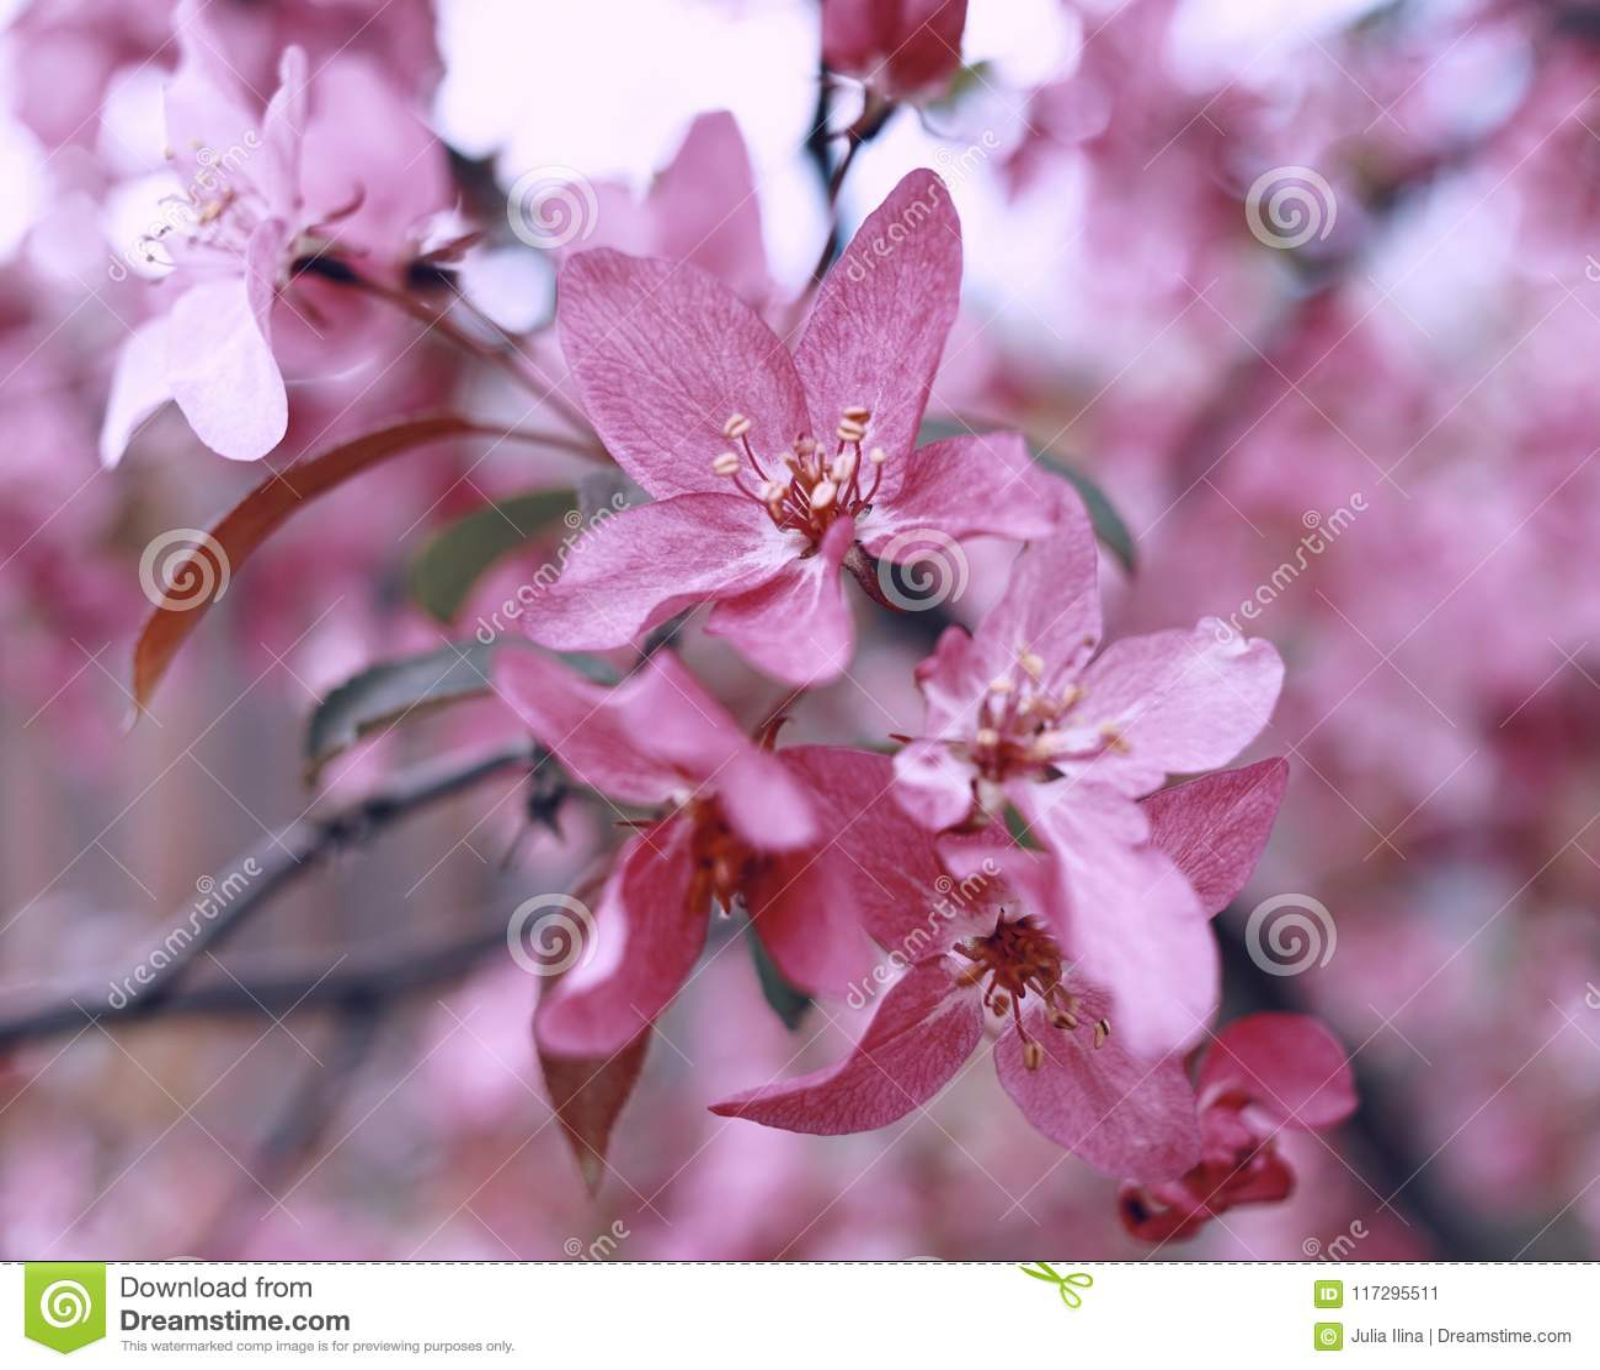 Pink Flowers Close Up Garden Outdoor Apple Blossom Bokeh